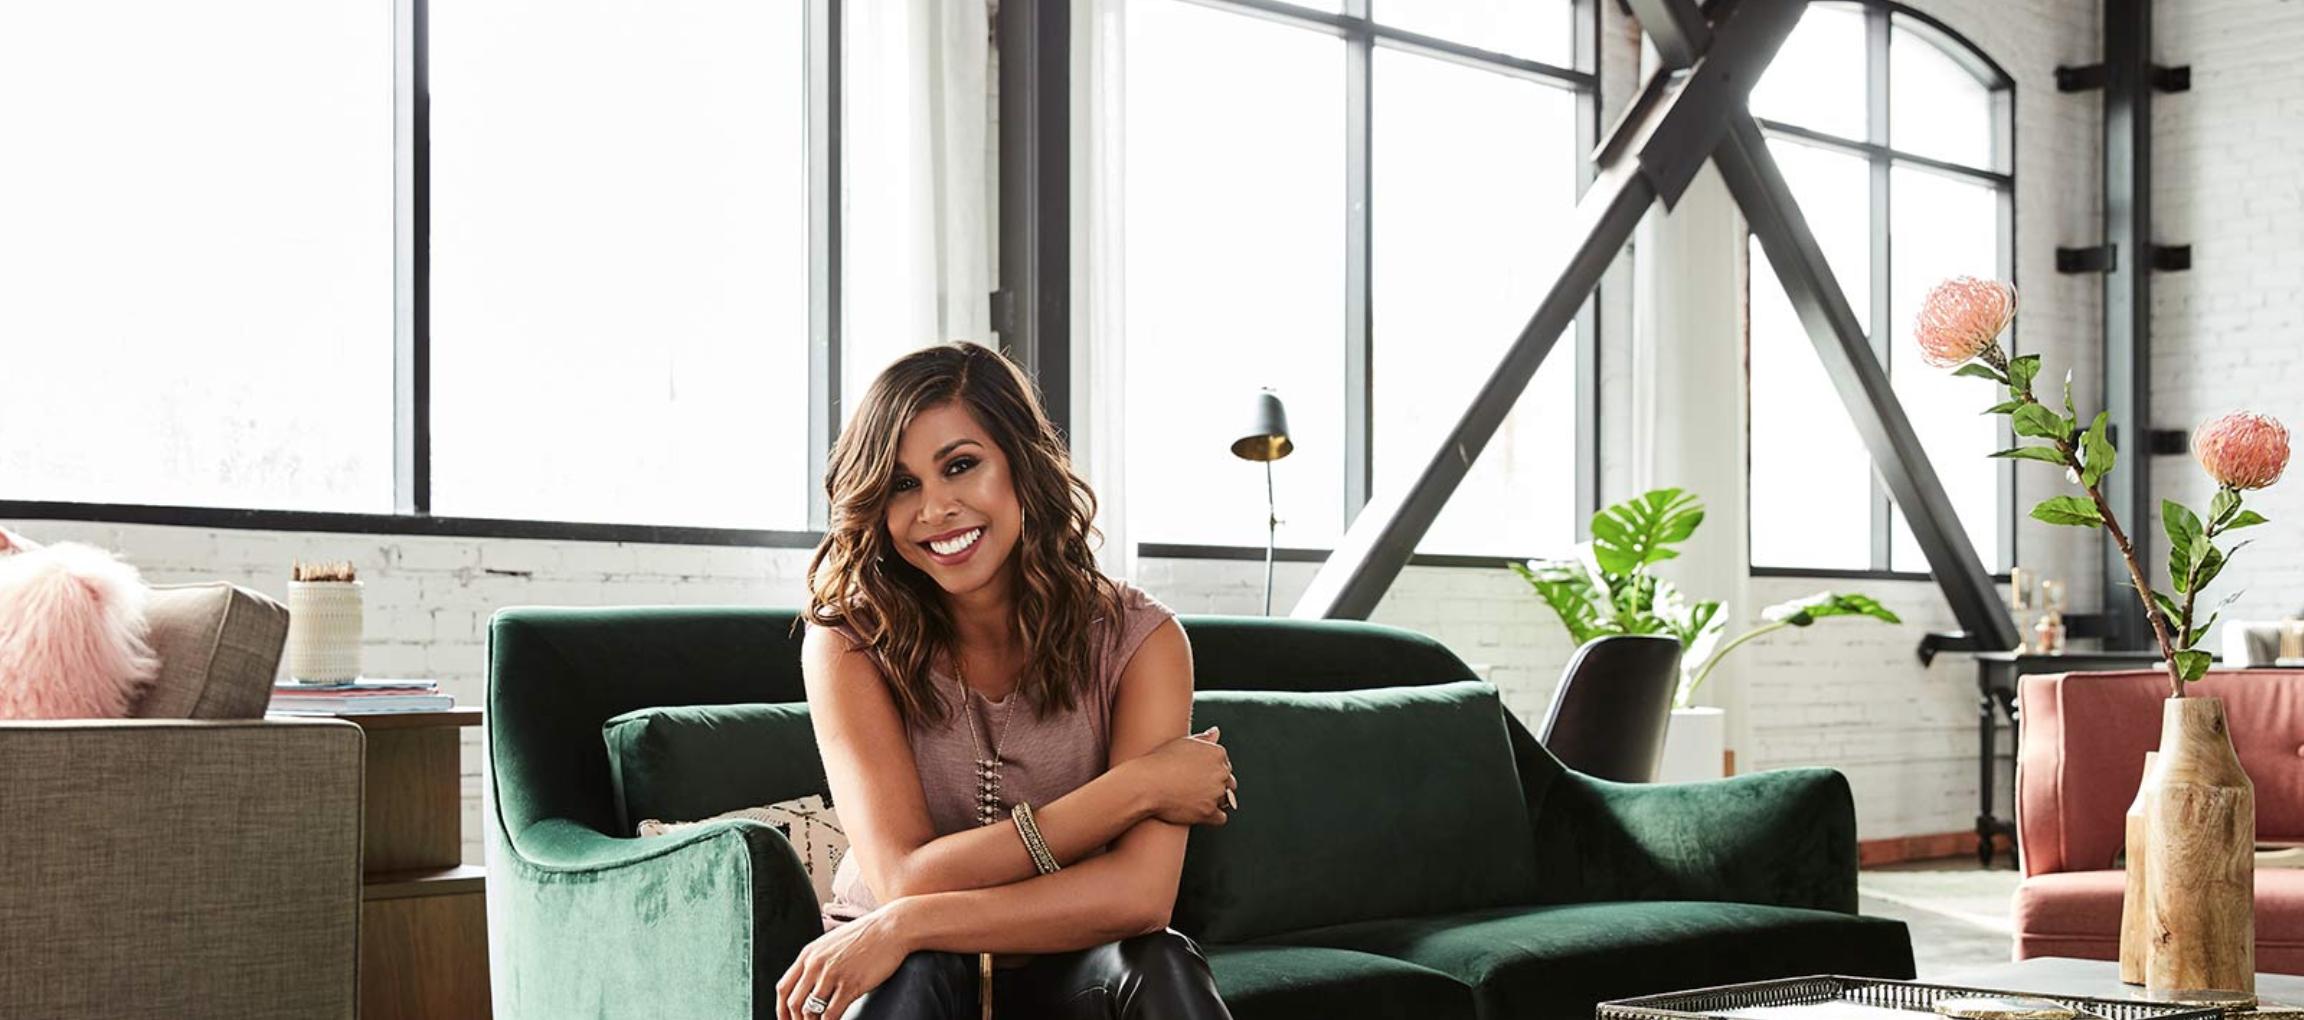 The Return of Restaurant: Impossible – Interview with Designer Taniya Nayak